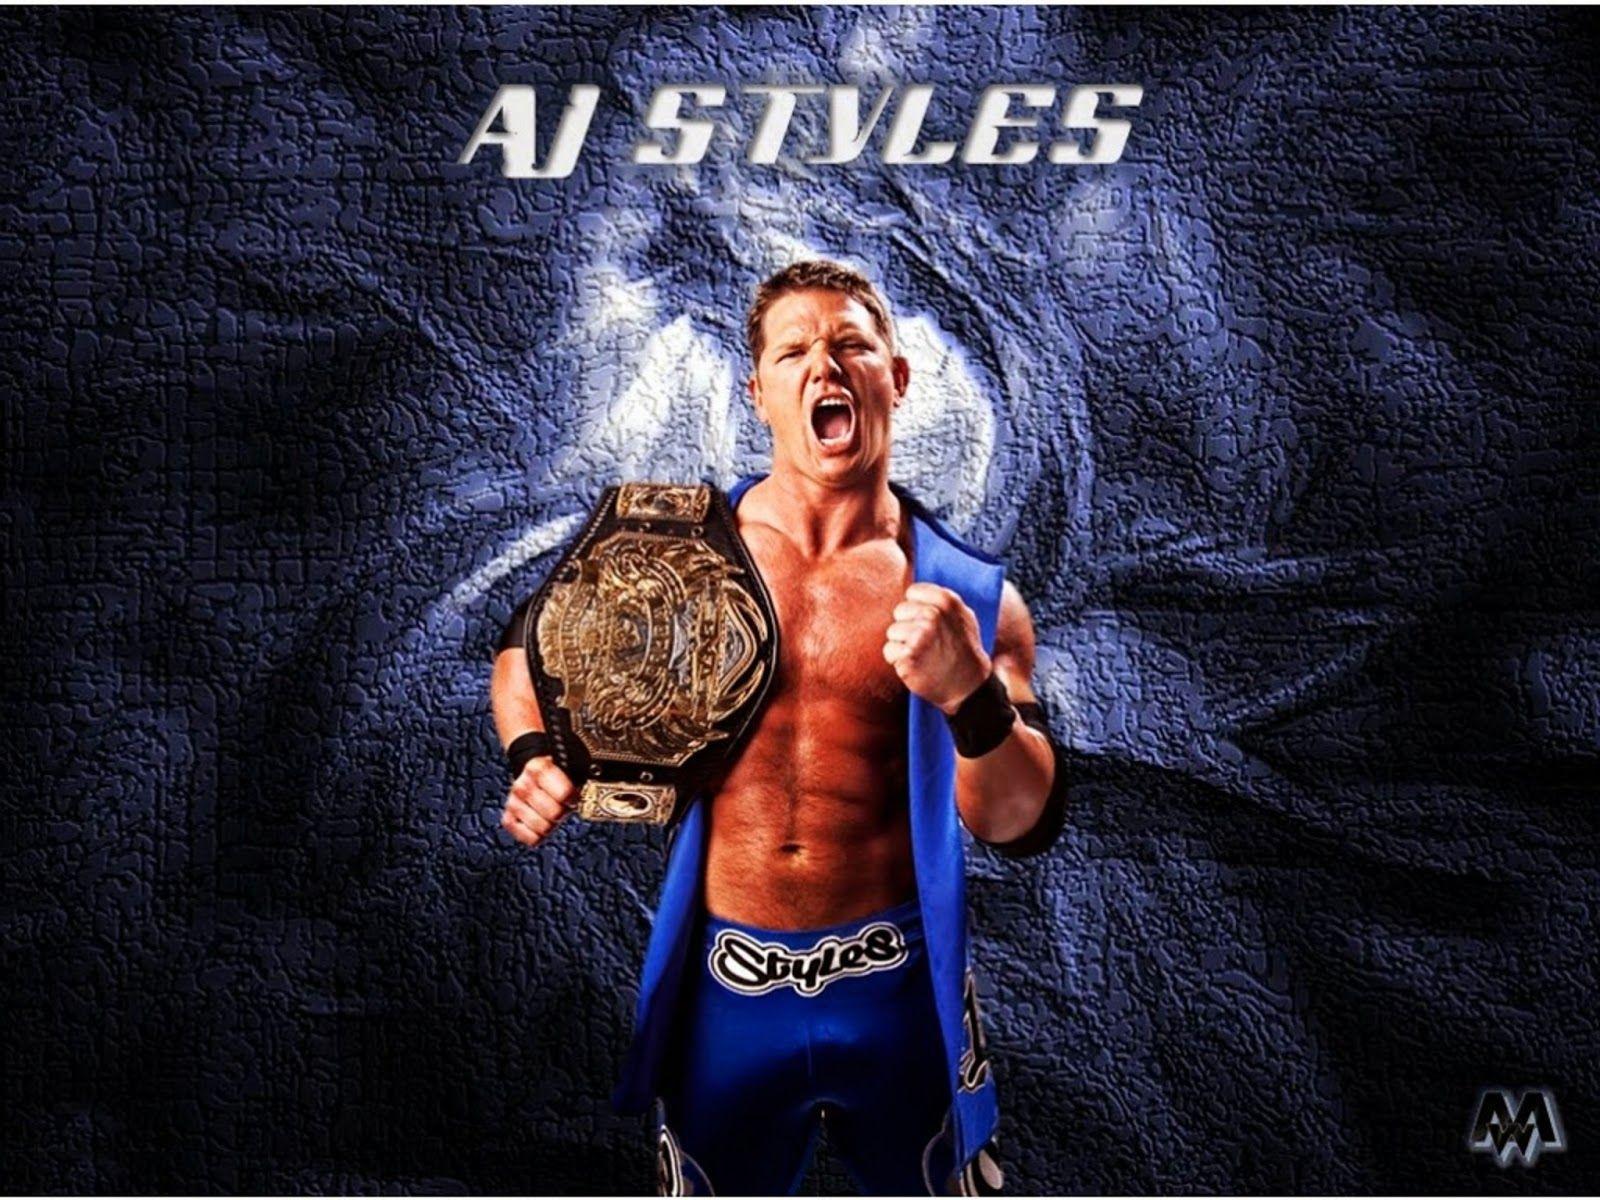 AJ Styles 2019 Wallpapers - Wallpaper Cave